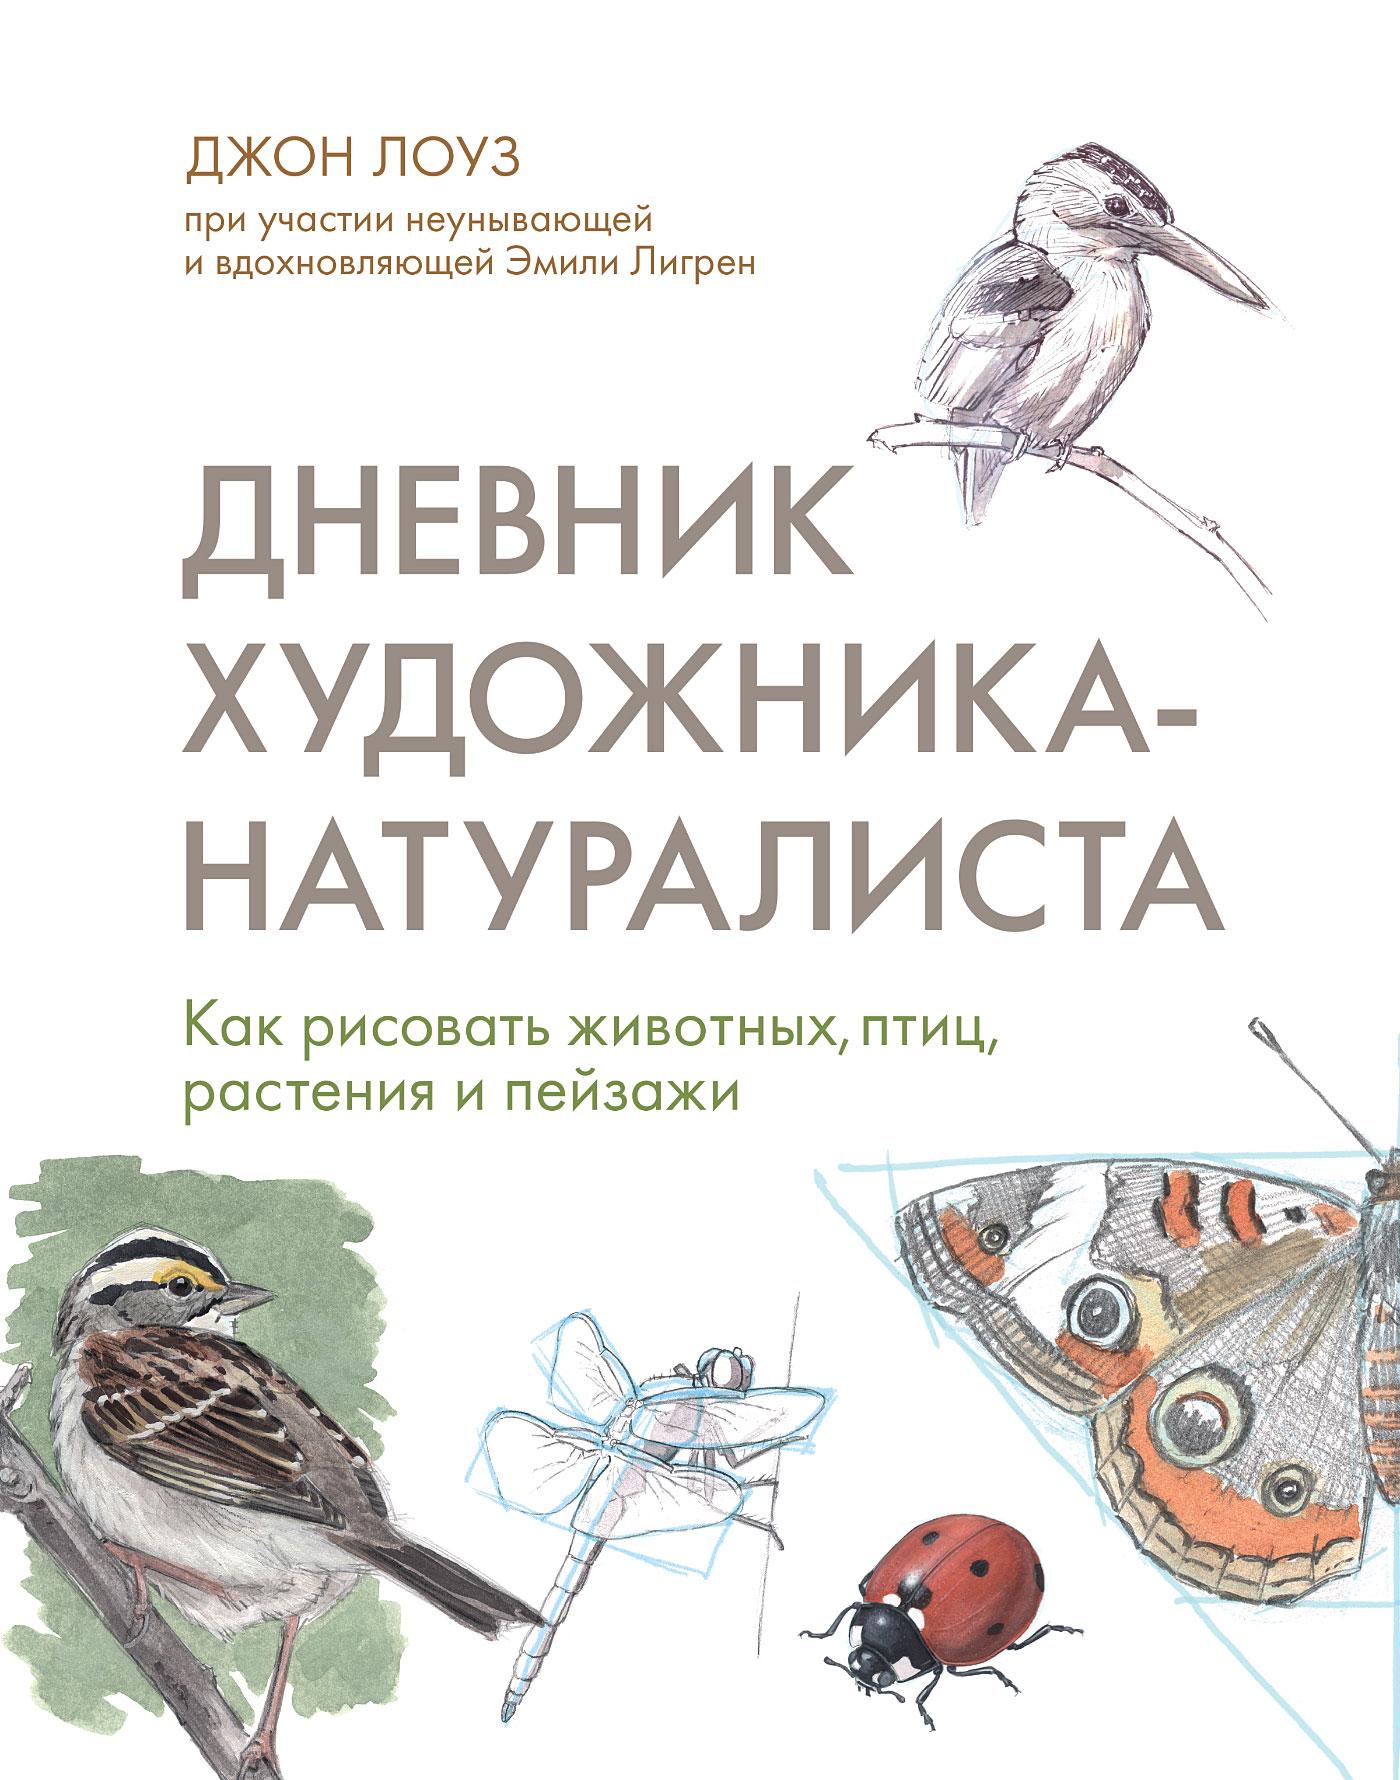 Джон Лоуз Дневник художника-натуралиста